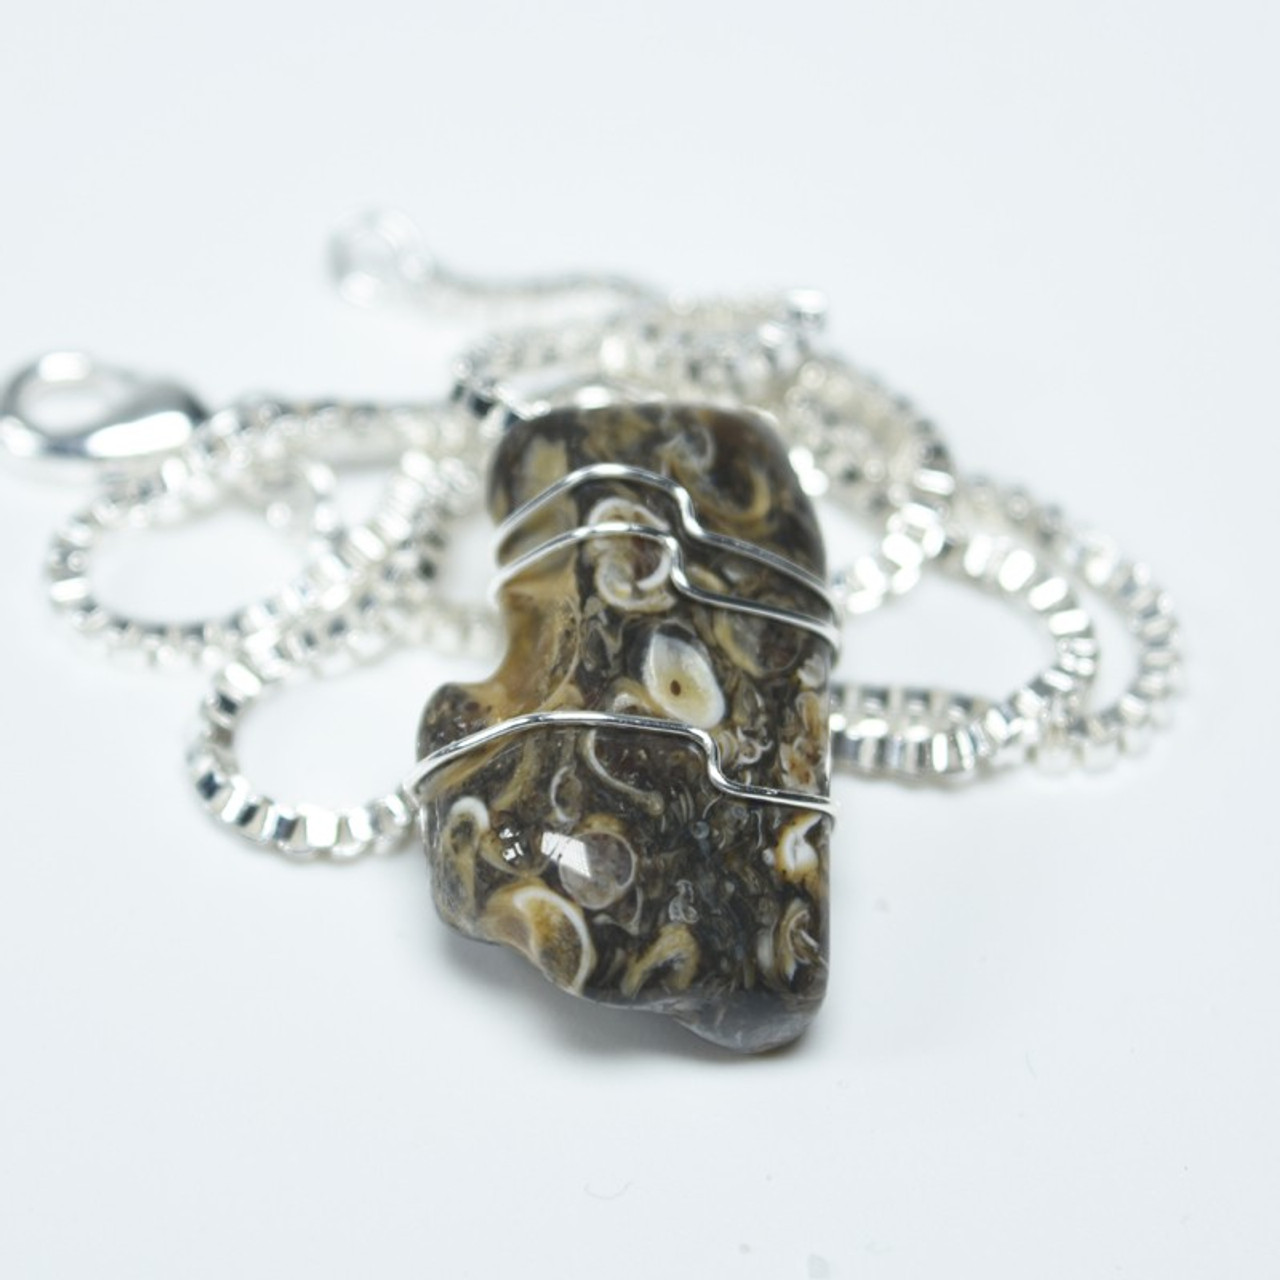 Turritella Stone Necklace